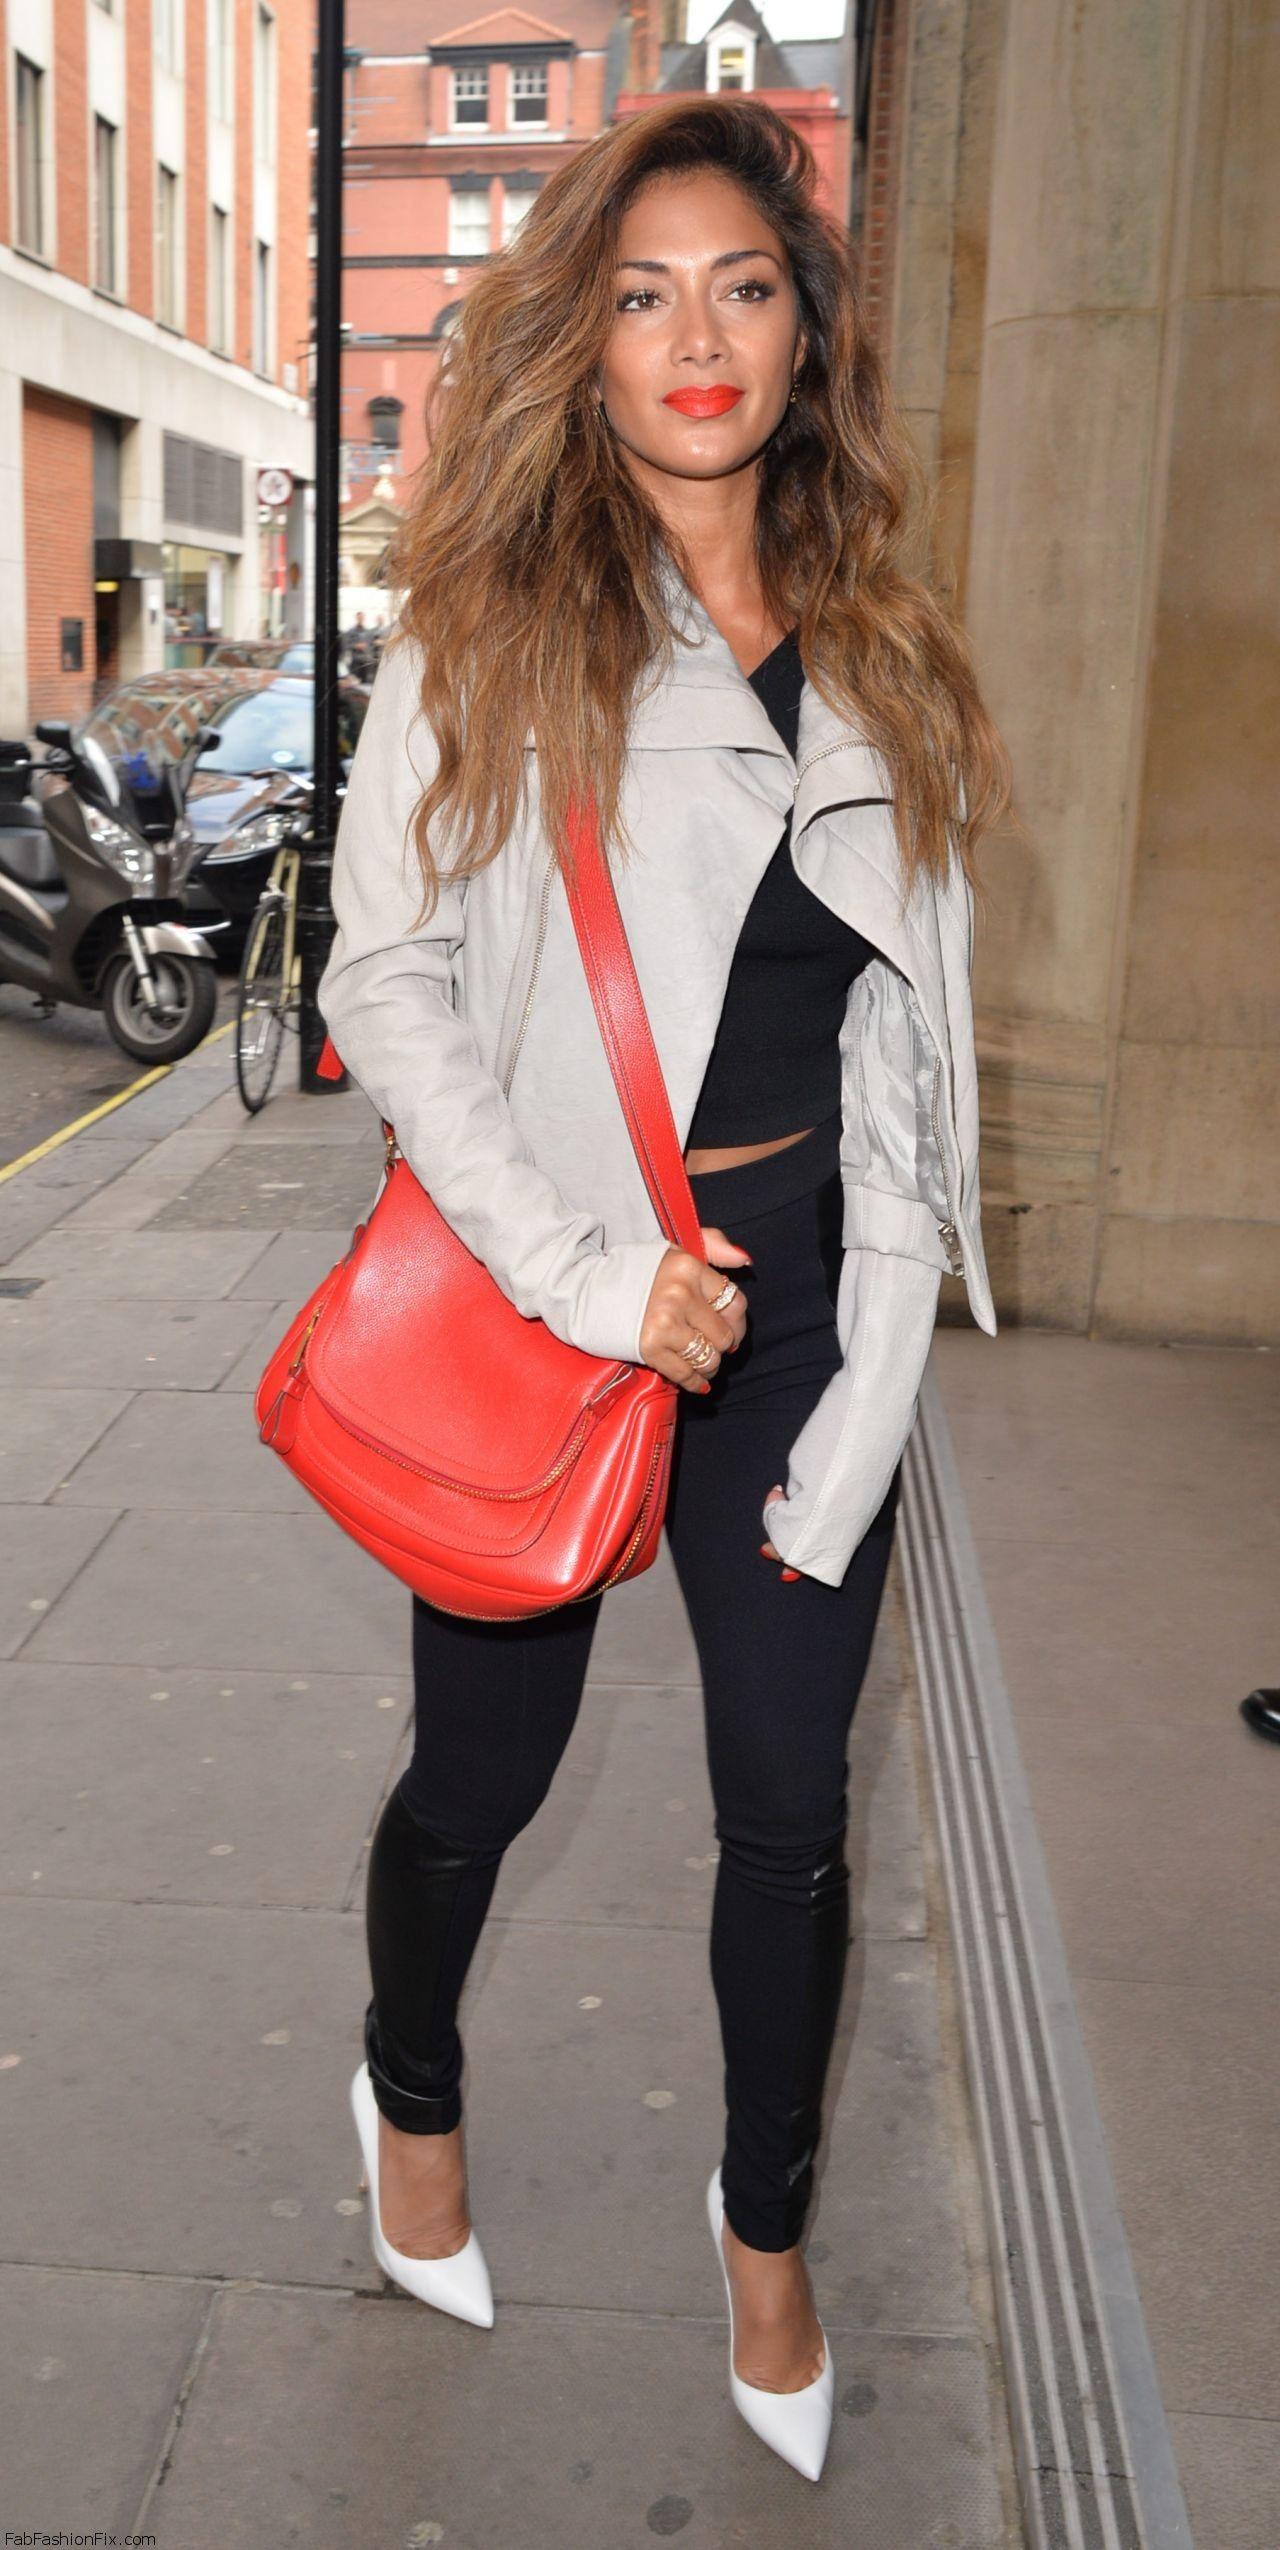 Nicole Scherzinger Fabulous Street Style Black Skinny Pants Top Beige Jacket White